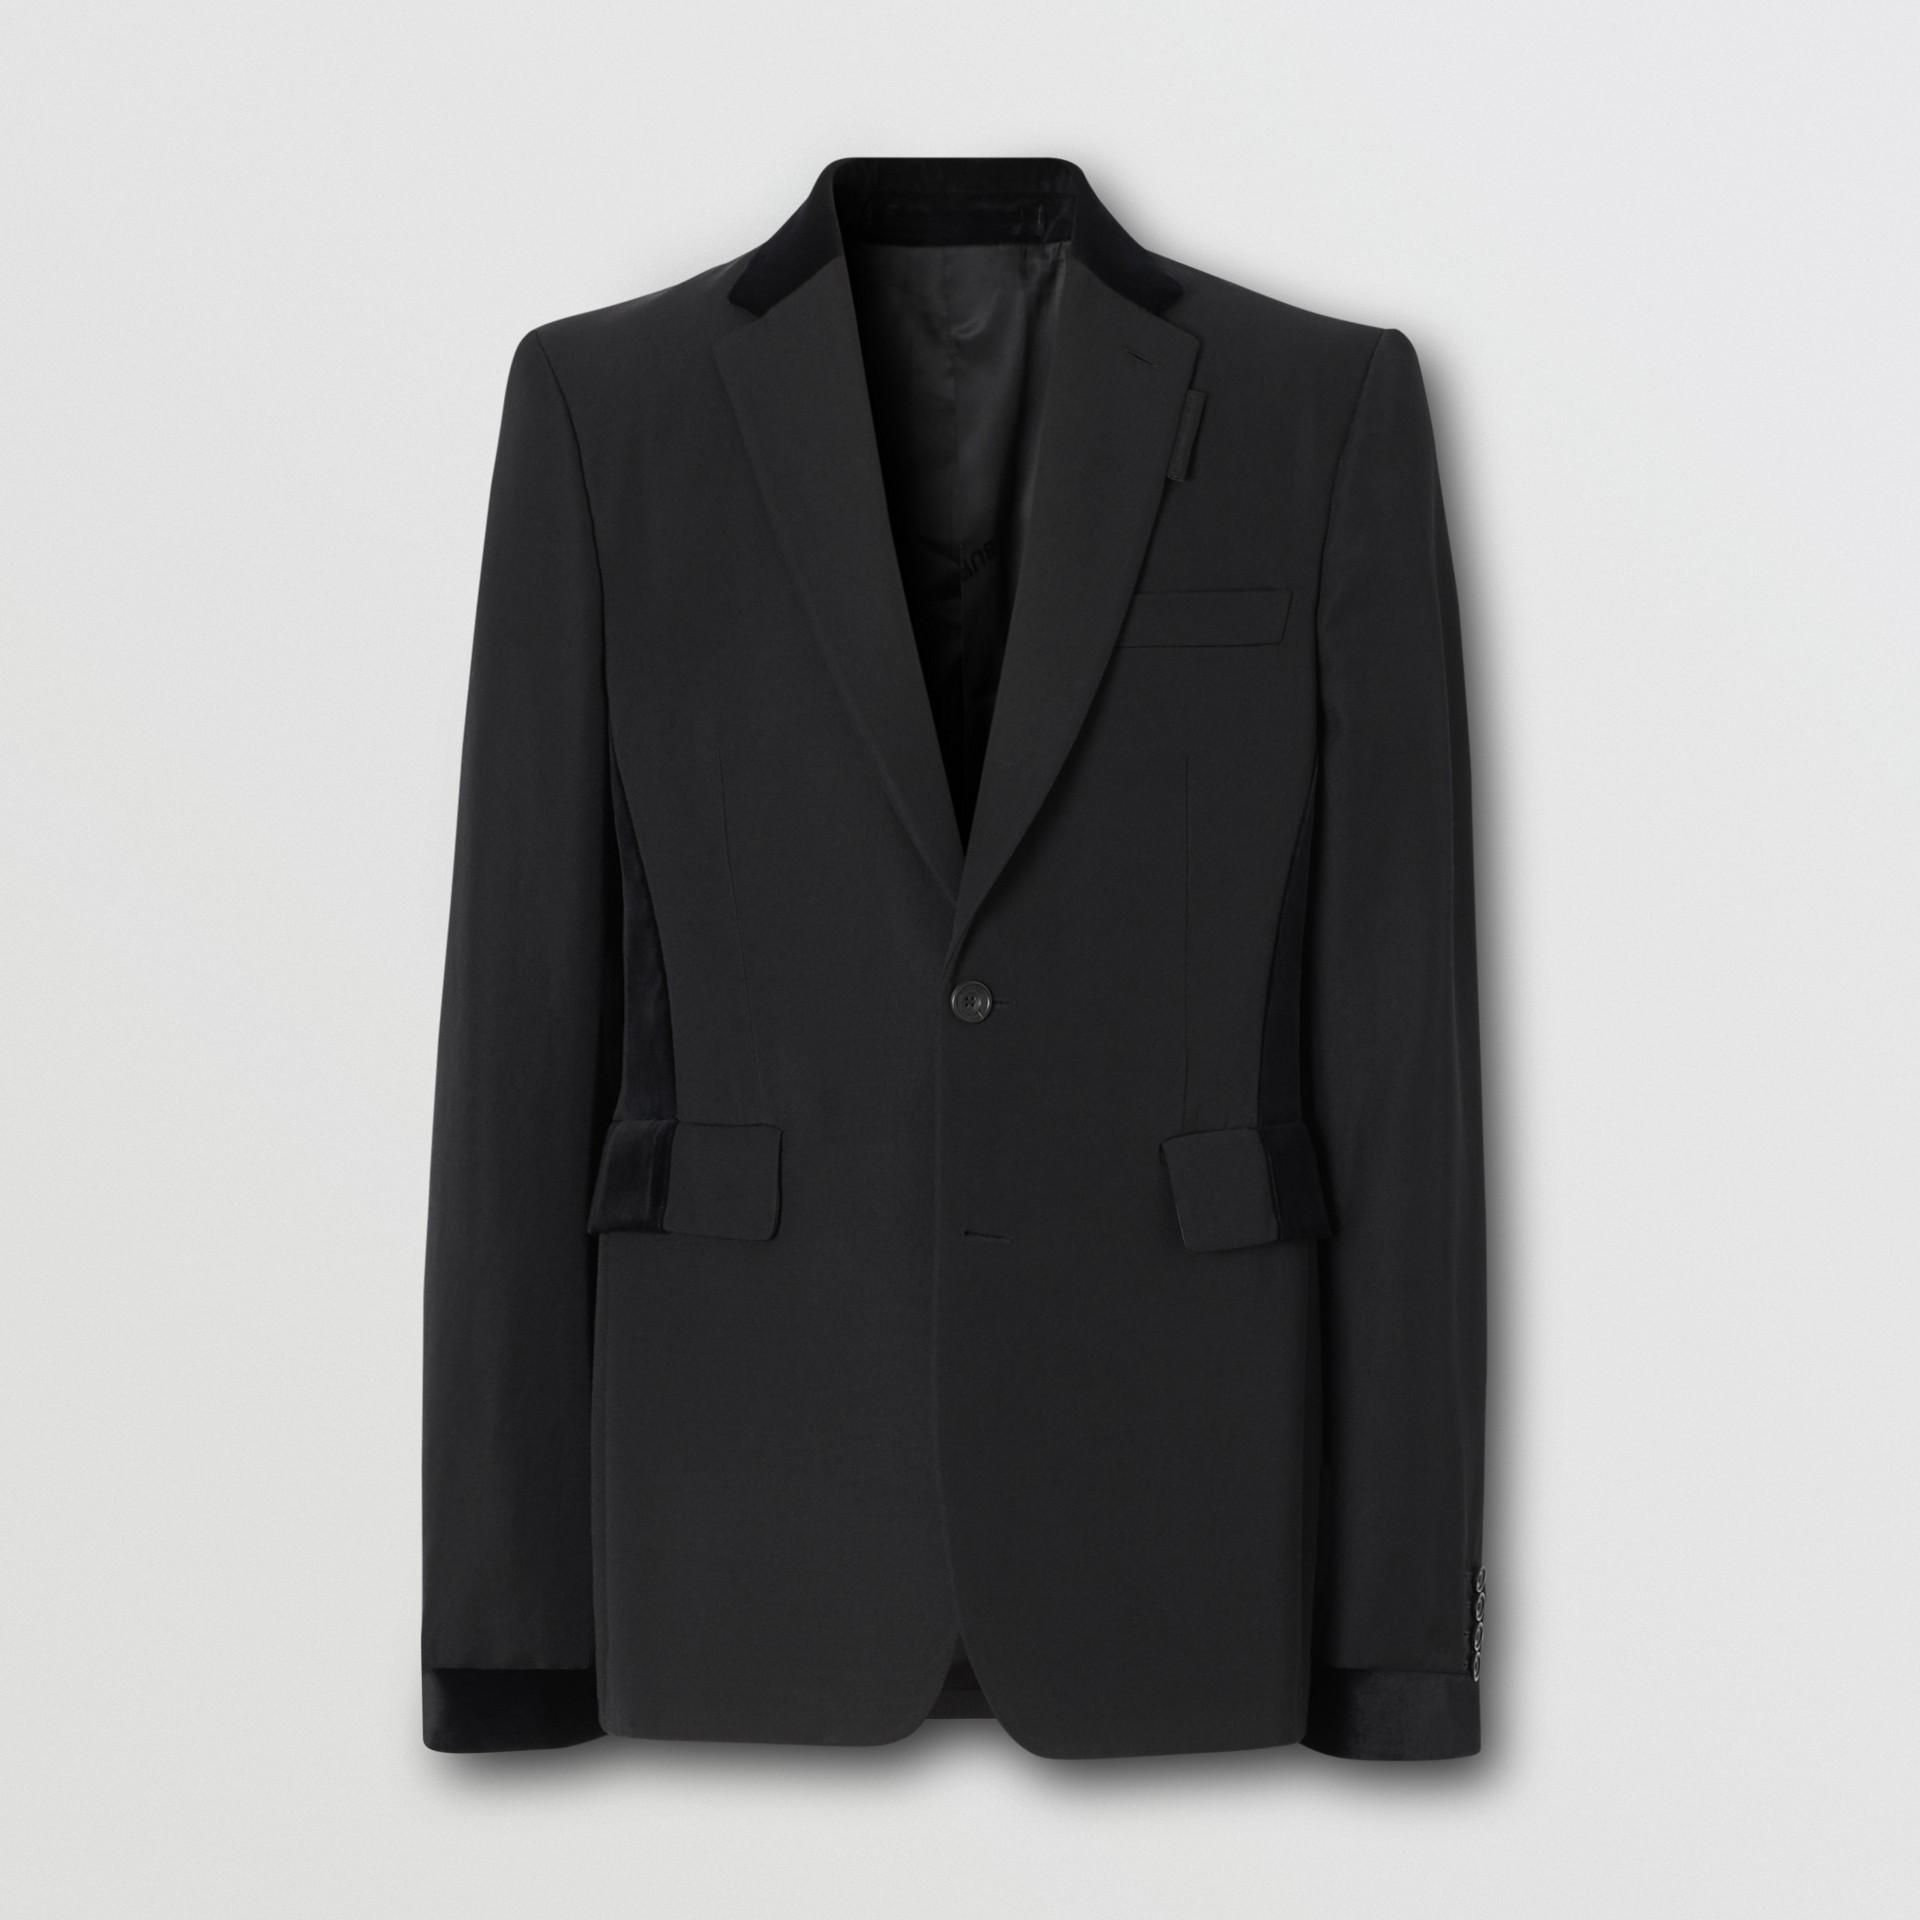 Classic Fit Velvet Trim Wool Tailored Jacket in Black - Men | Burberry Australia - gallery image 3